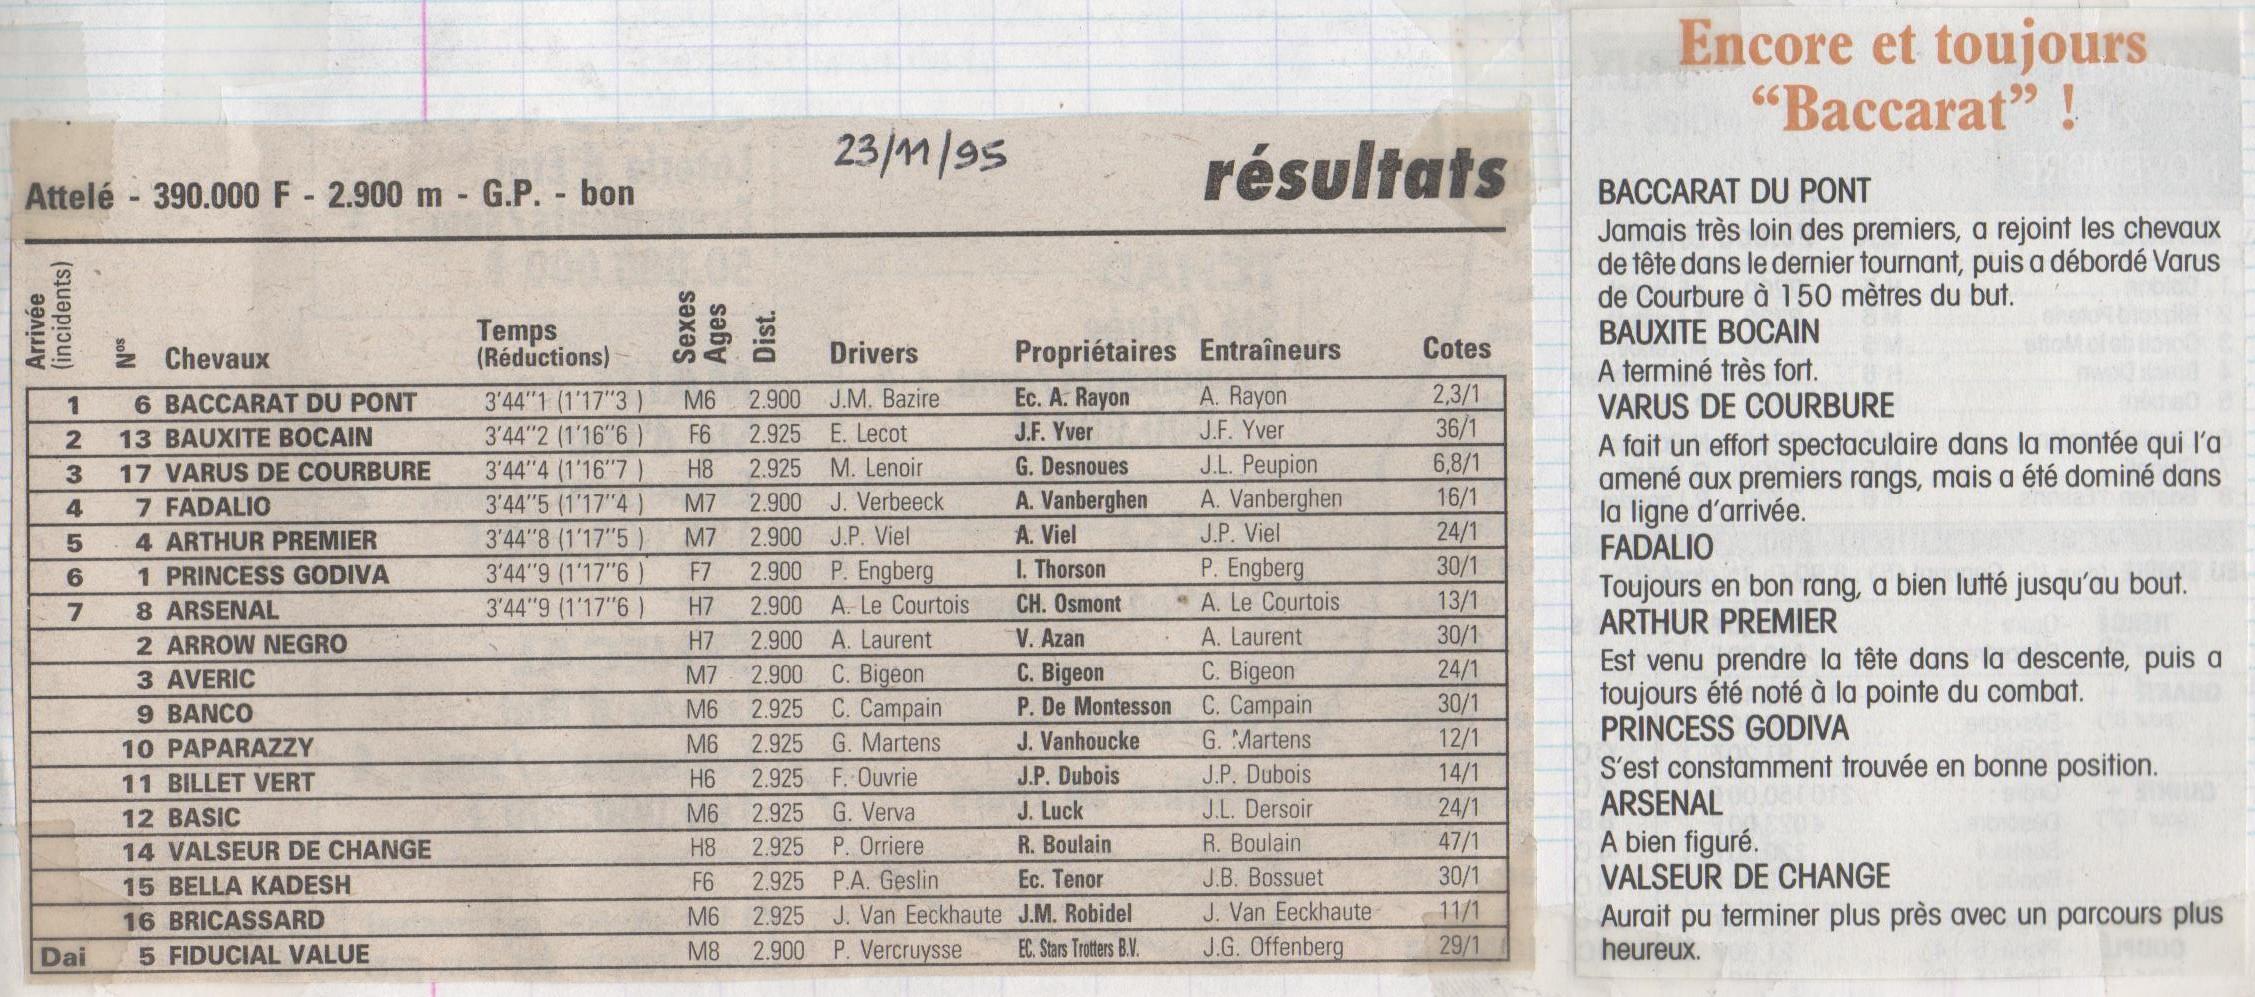 1995 11 23 Baccarat du Pont Prix du Languedoc (1)